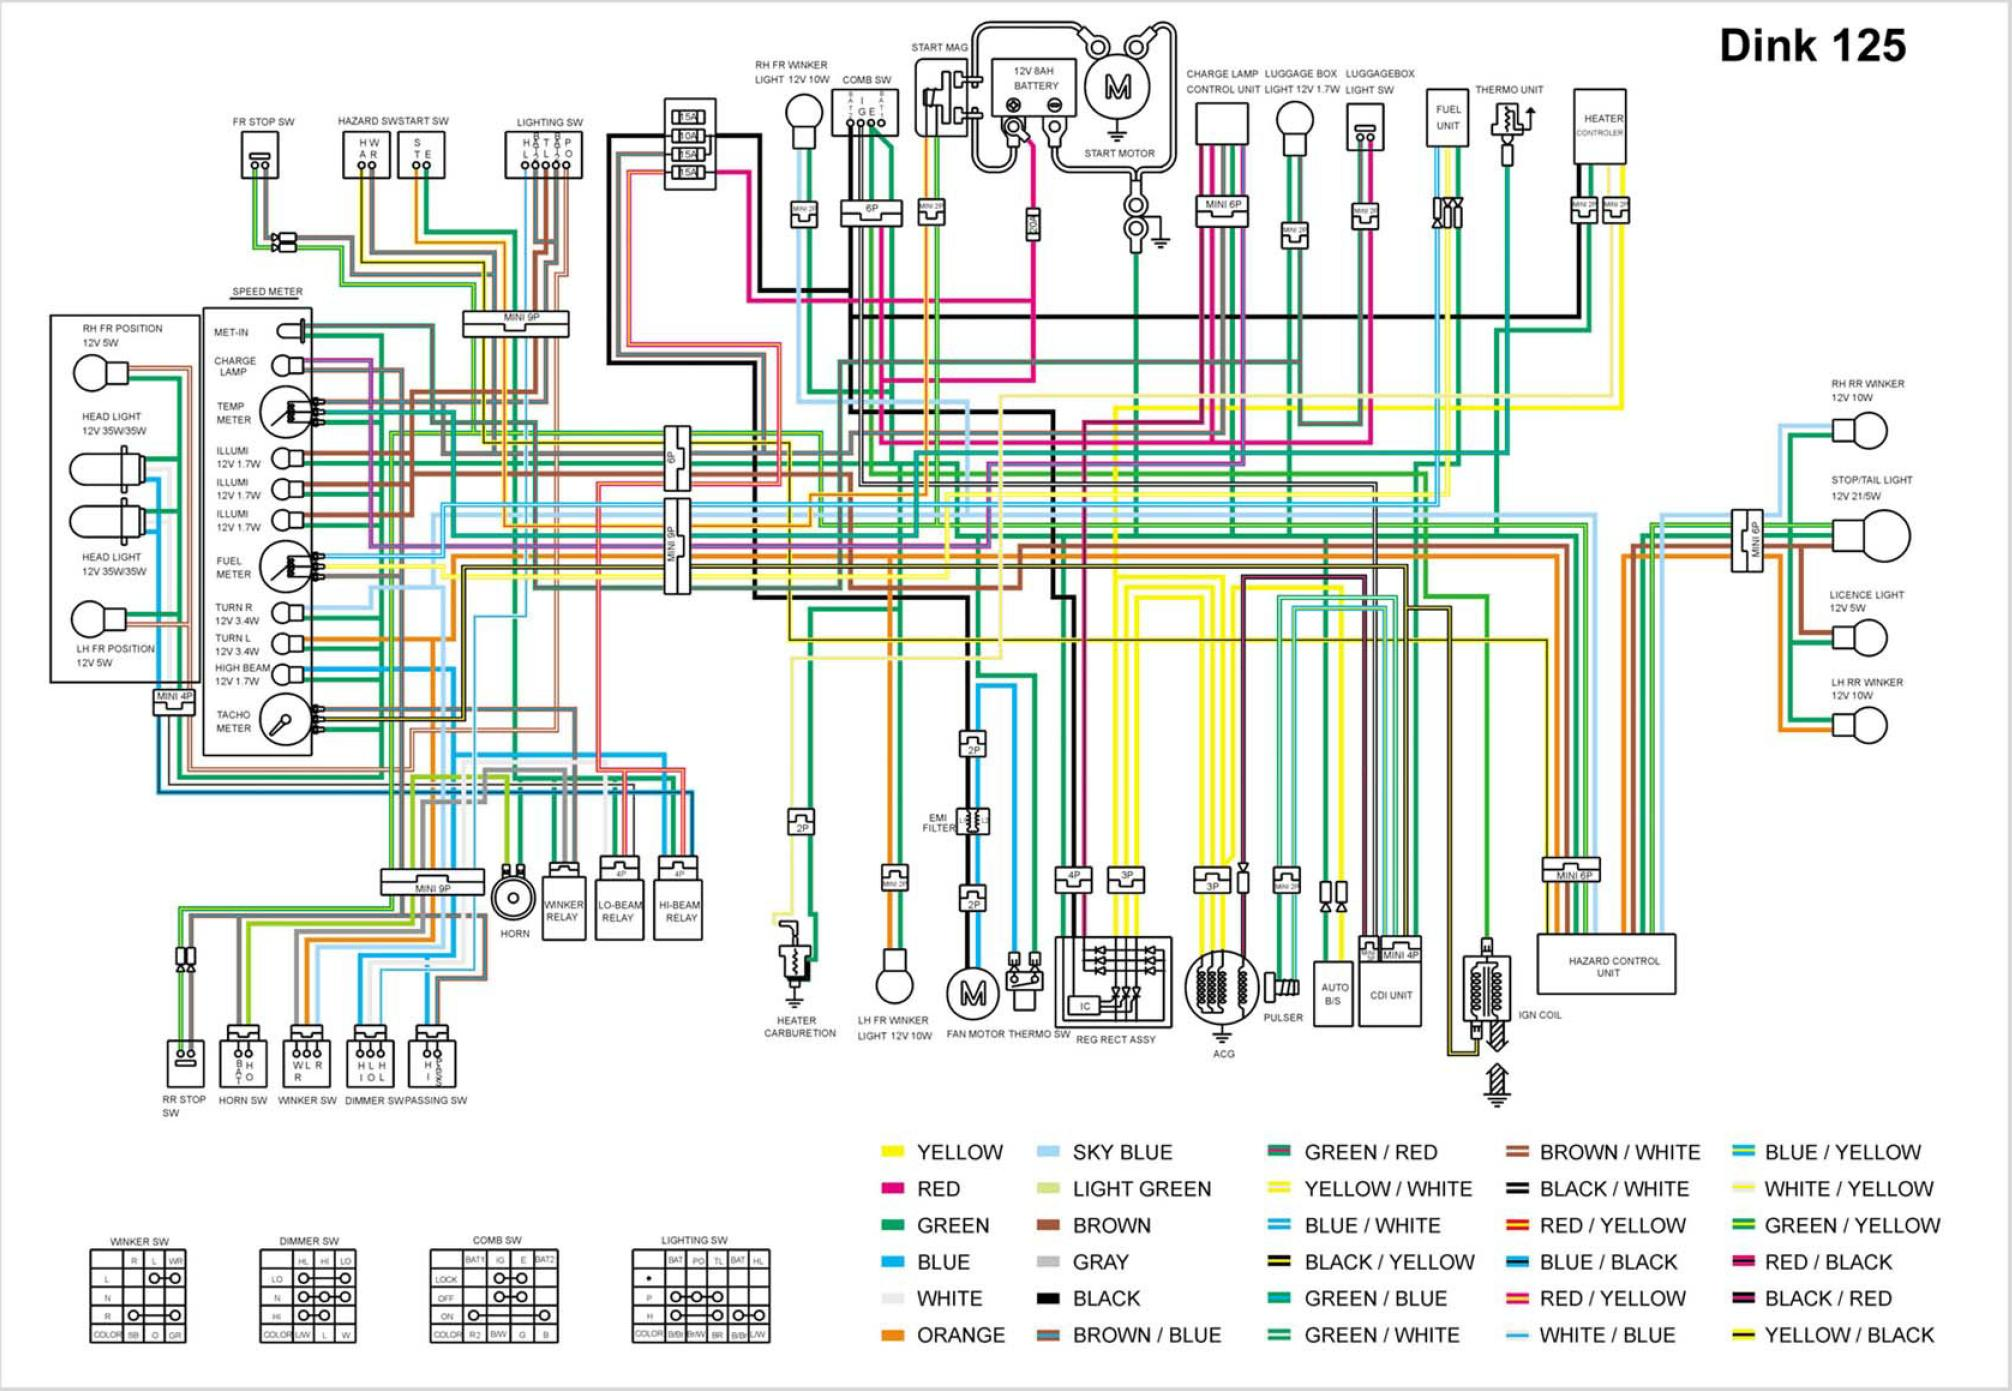 kymco motorcycle manuals pdf wiring diagrams fault codes rh motorcycle manual com